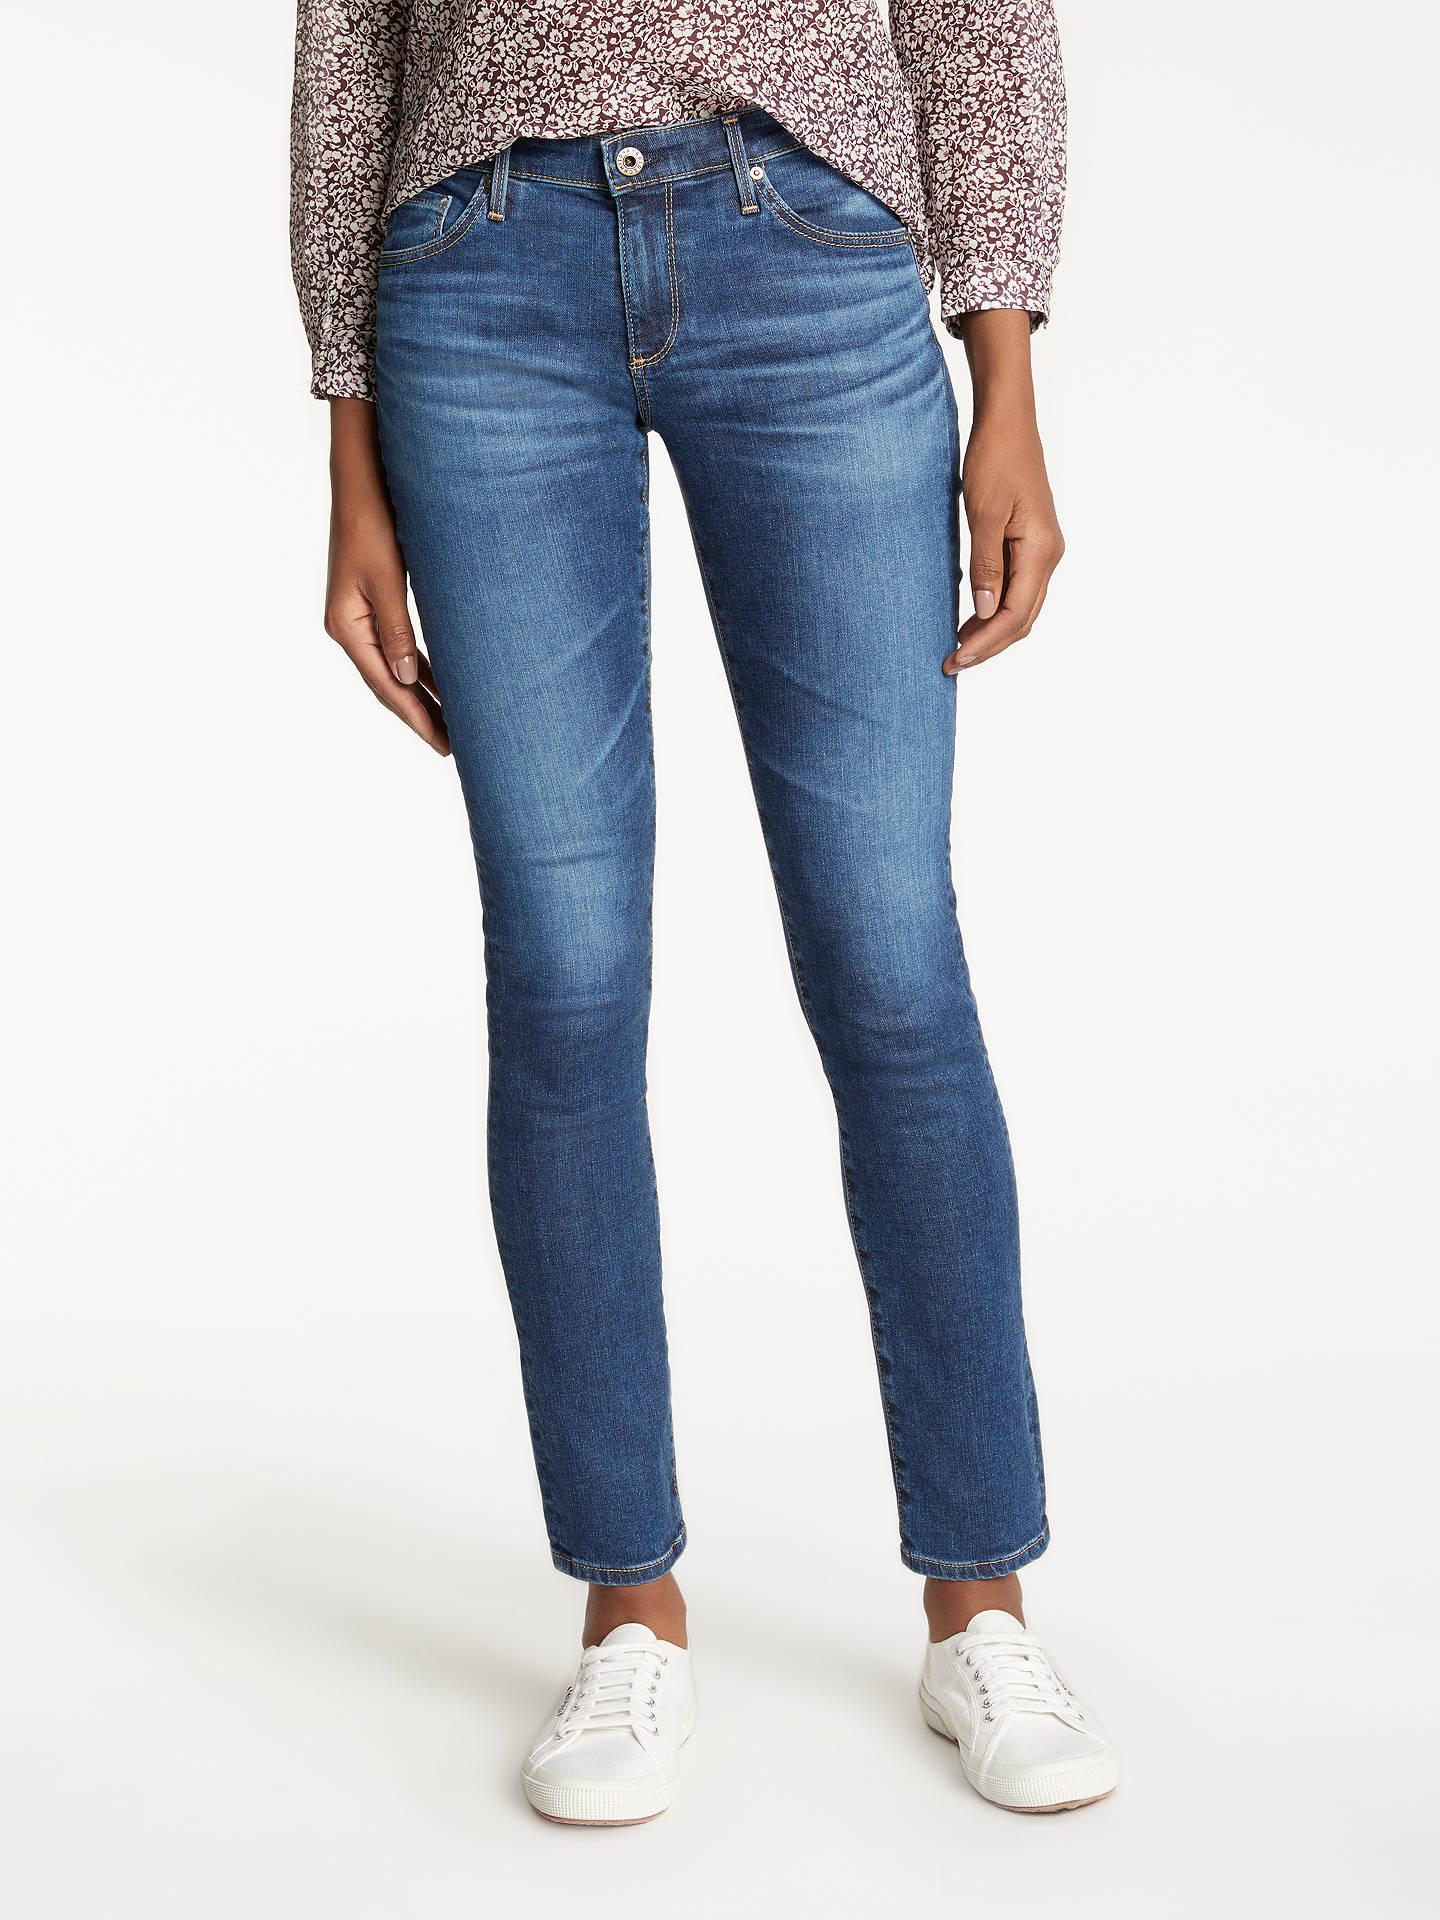 8ea4a083343eab AG The Stilt Mid Rise Skinny Jeans, Elysium at John Lewis & Partners